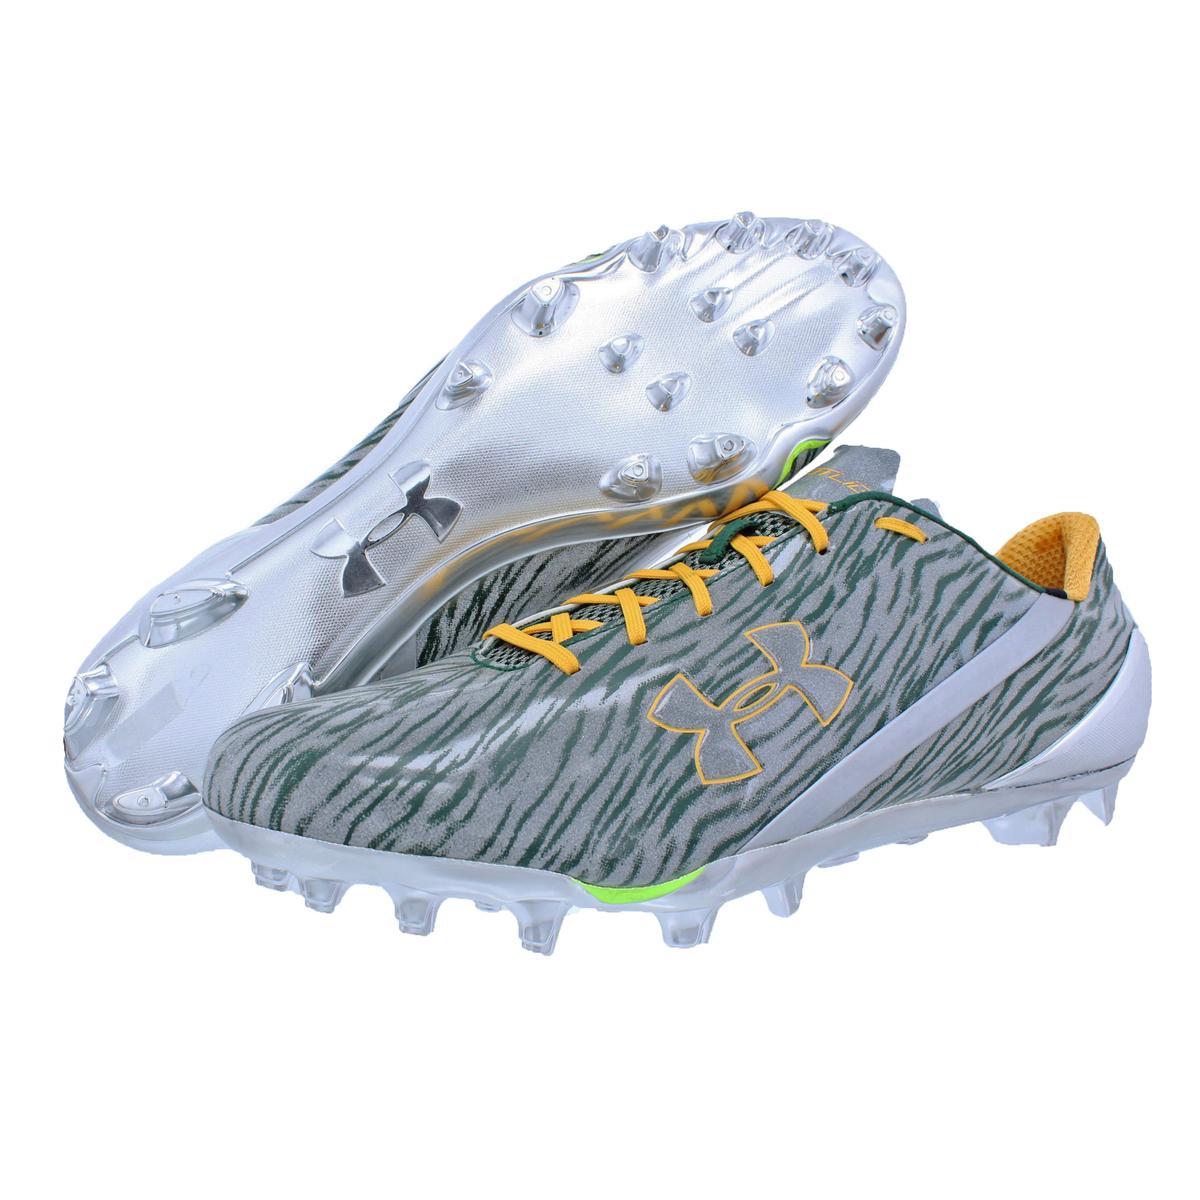 d1b134ea582 Under Armour Mens Spotlight Silver Football Cleats Shoes 16 Medium(d ...